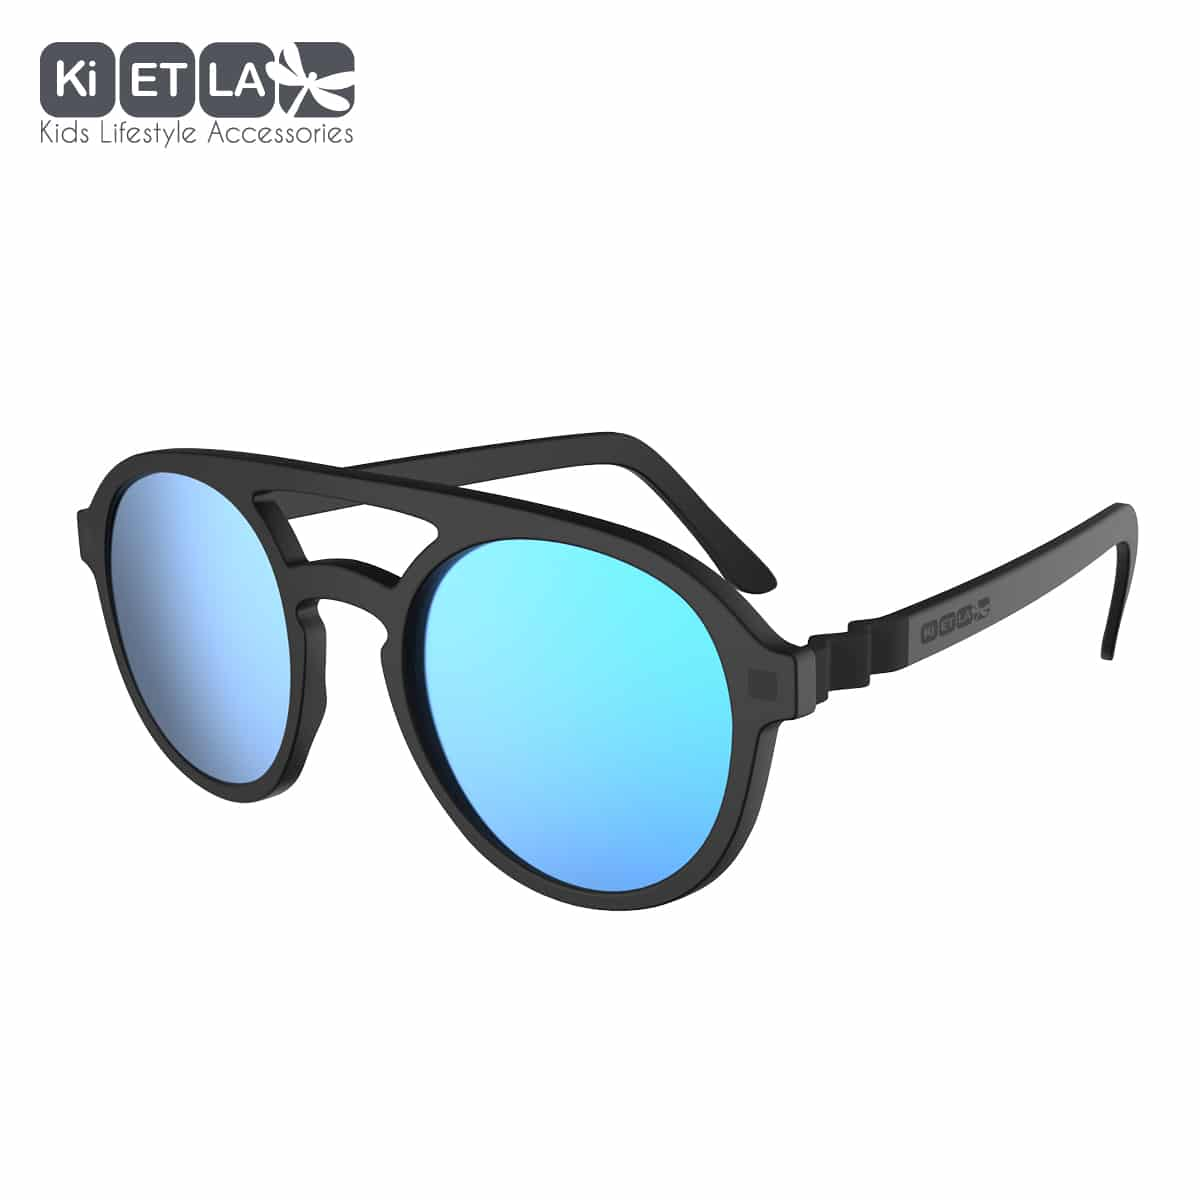 KiETLA CraZyg-Zag slnečné okuliare PiZZ 6-9 rokov